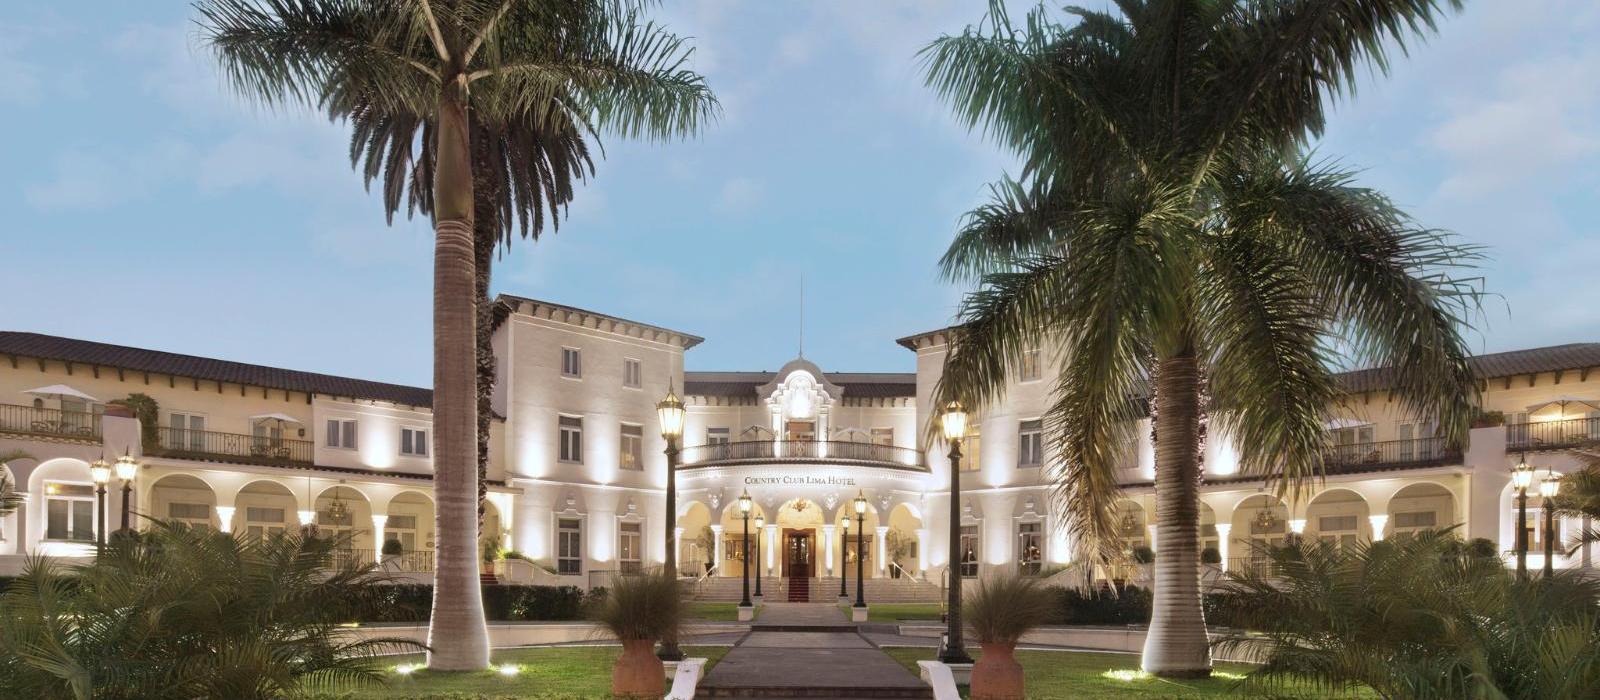 利马乡村会所酒店(Country Club Lima Hotel) 图片  www.lhw.cn